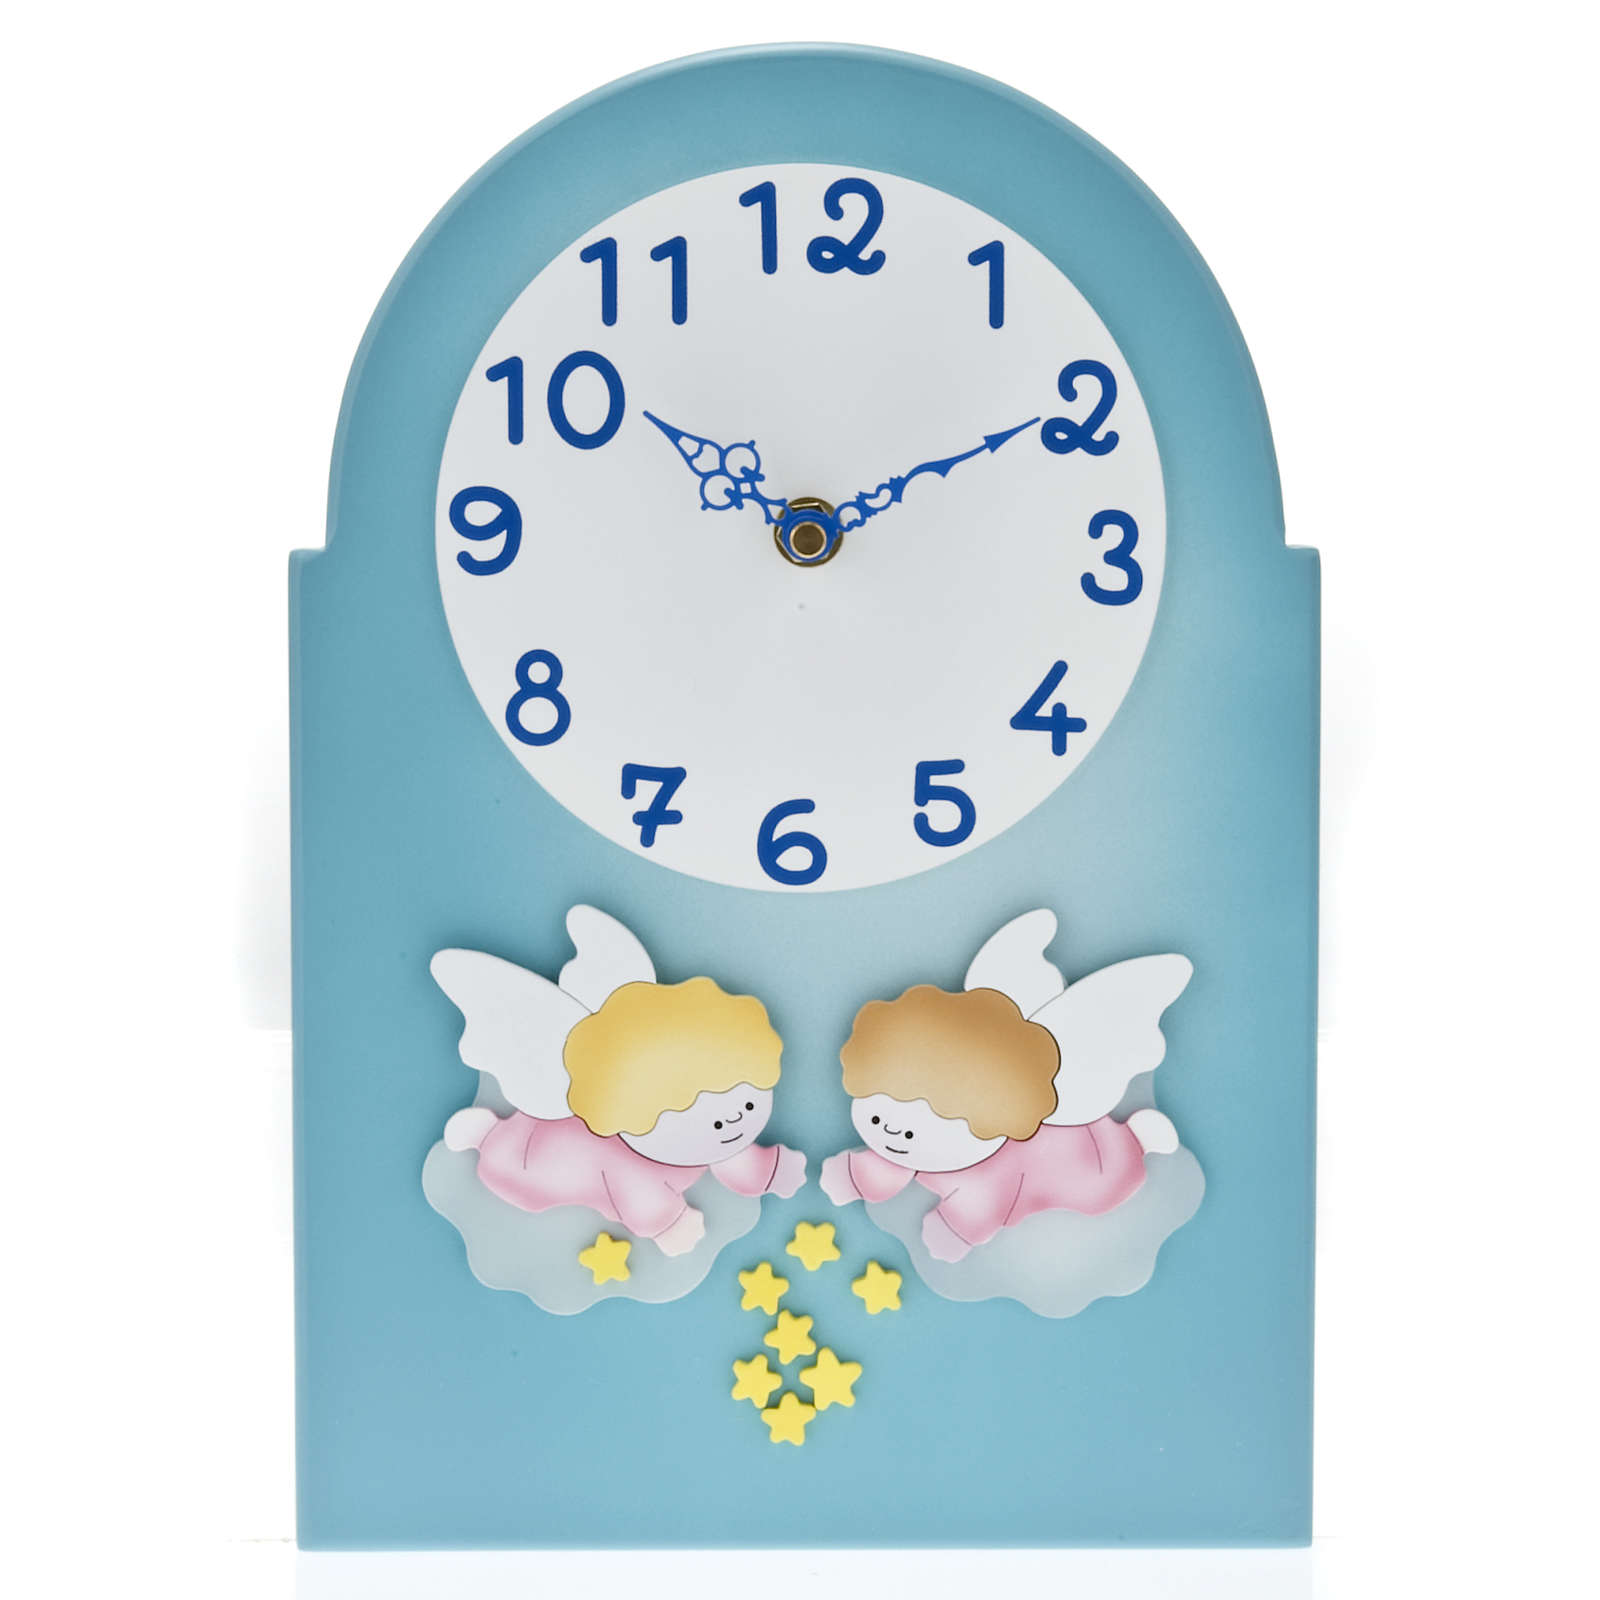 Pala orologio con angeli 4